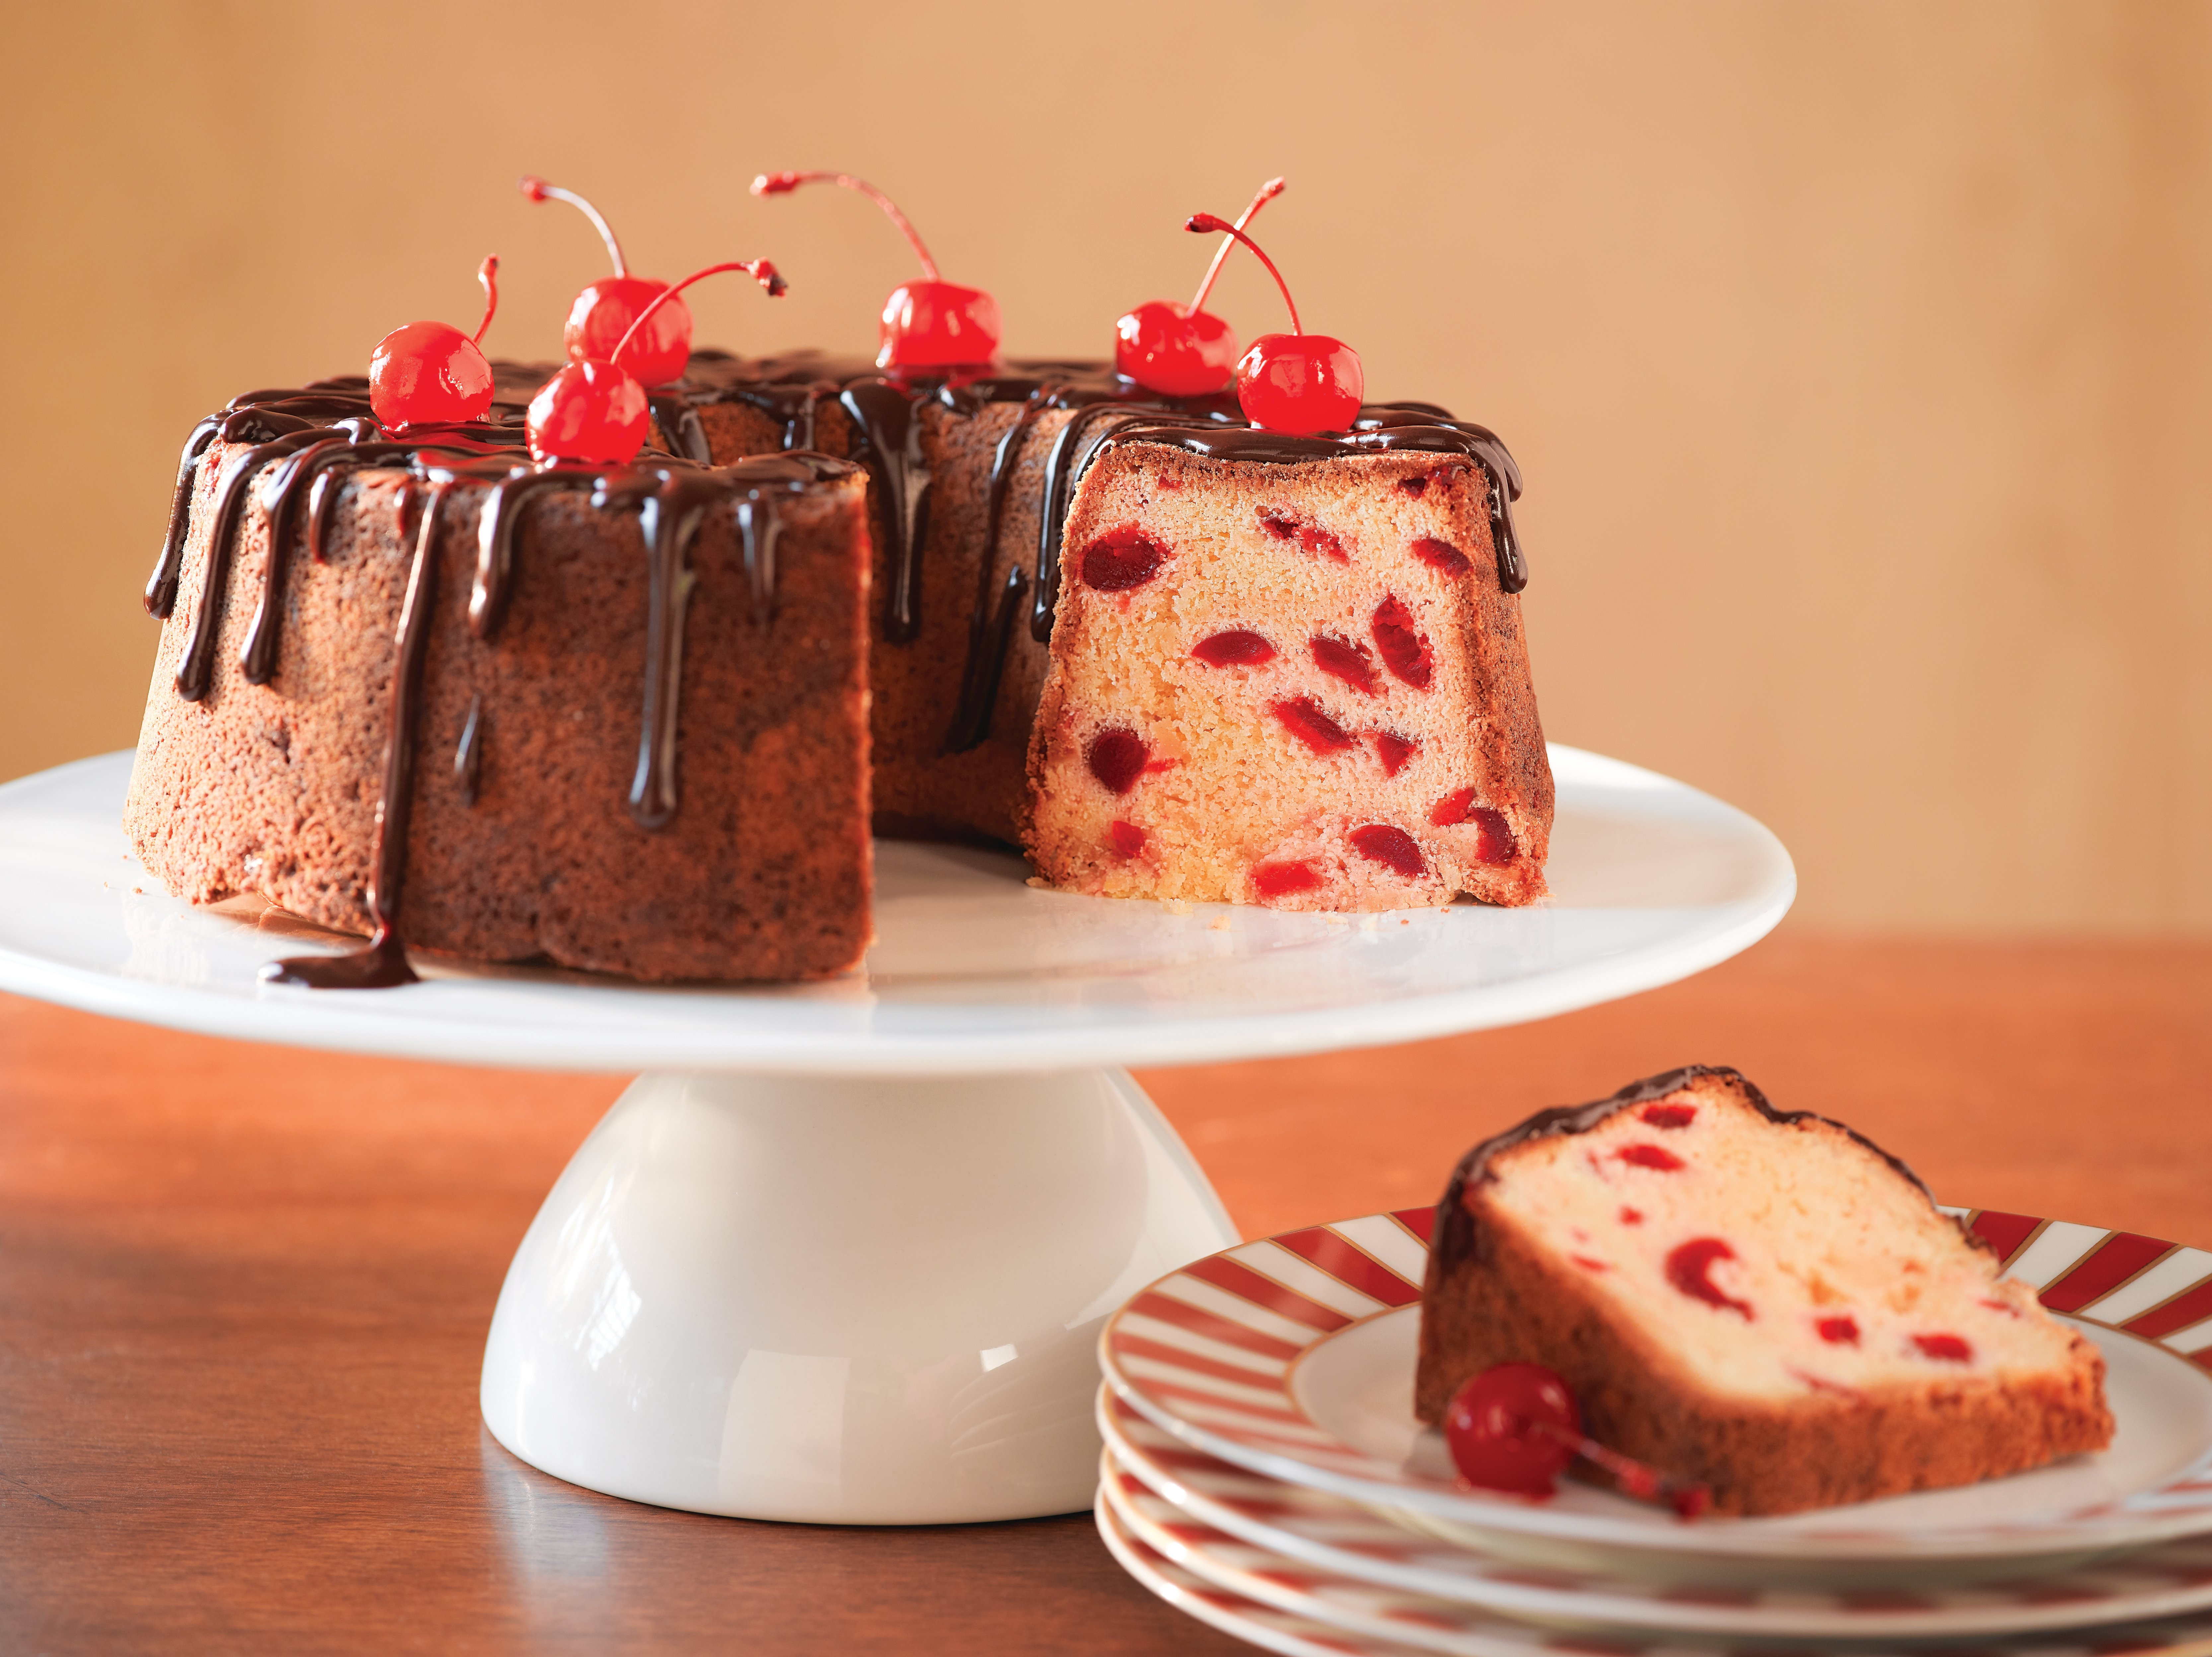 Pound Cake con Cerezas